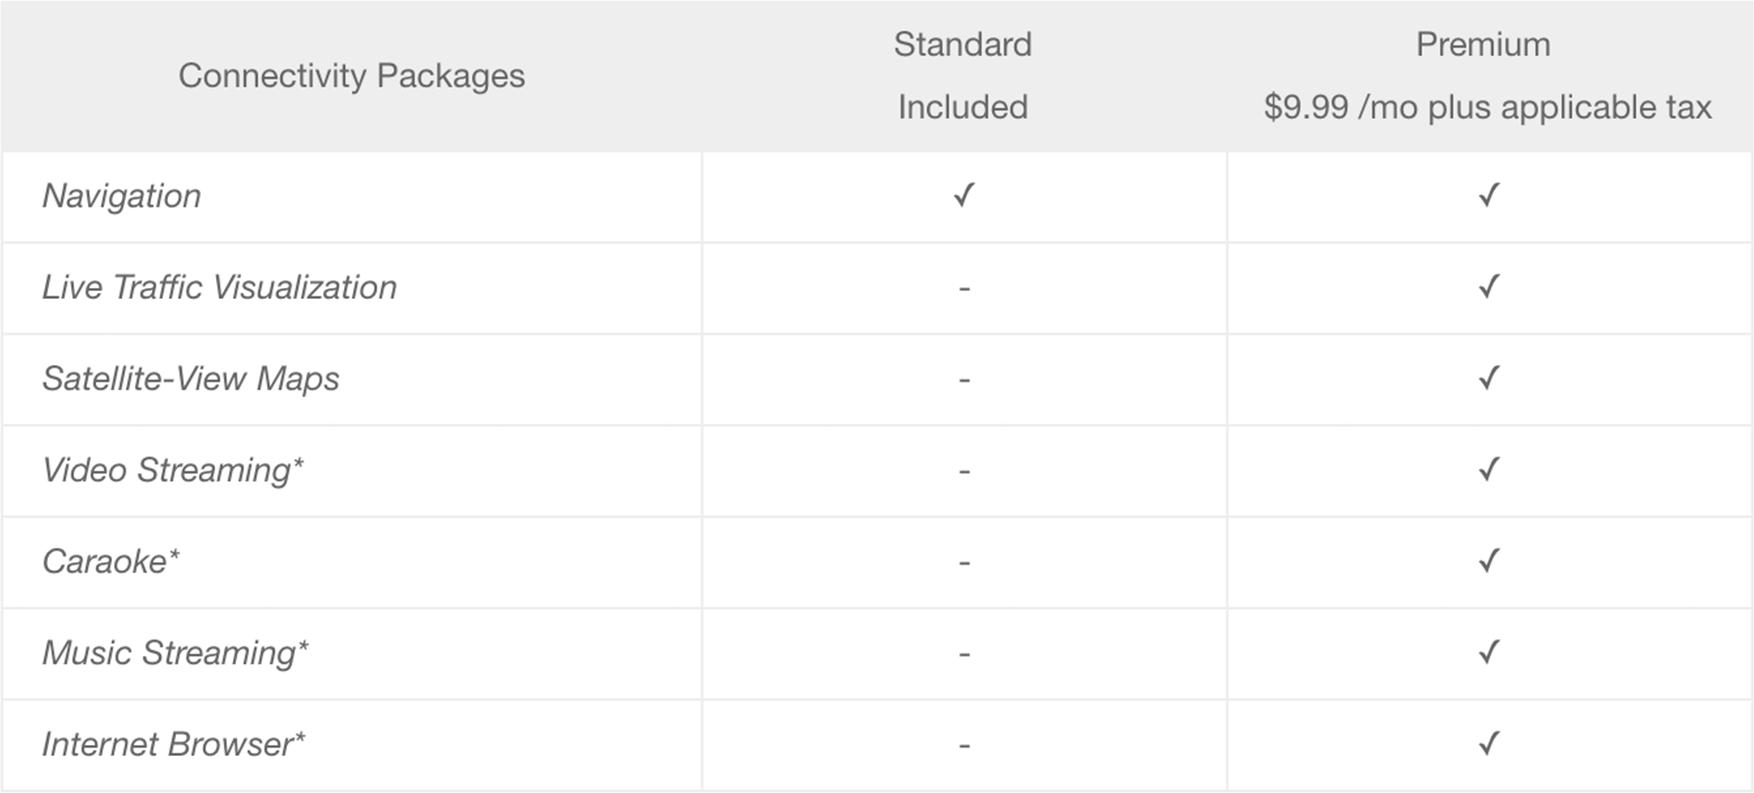 Feature breakdown of Premium Connectivity versus Standard Connectivity